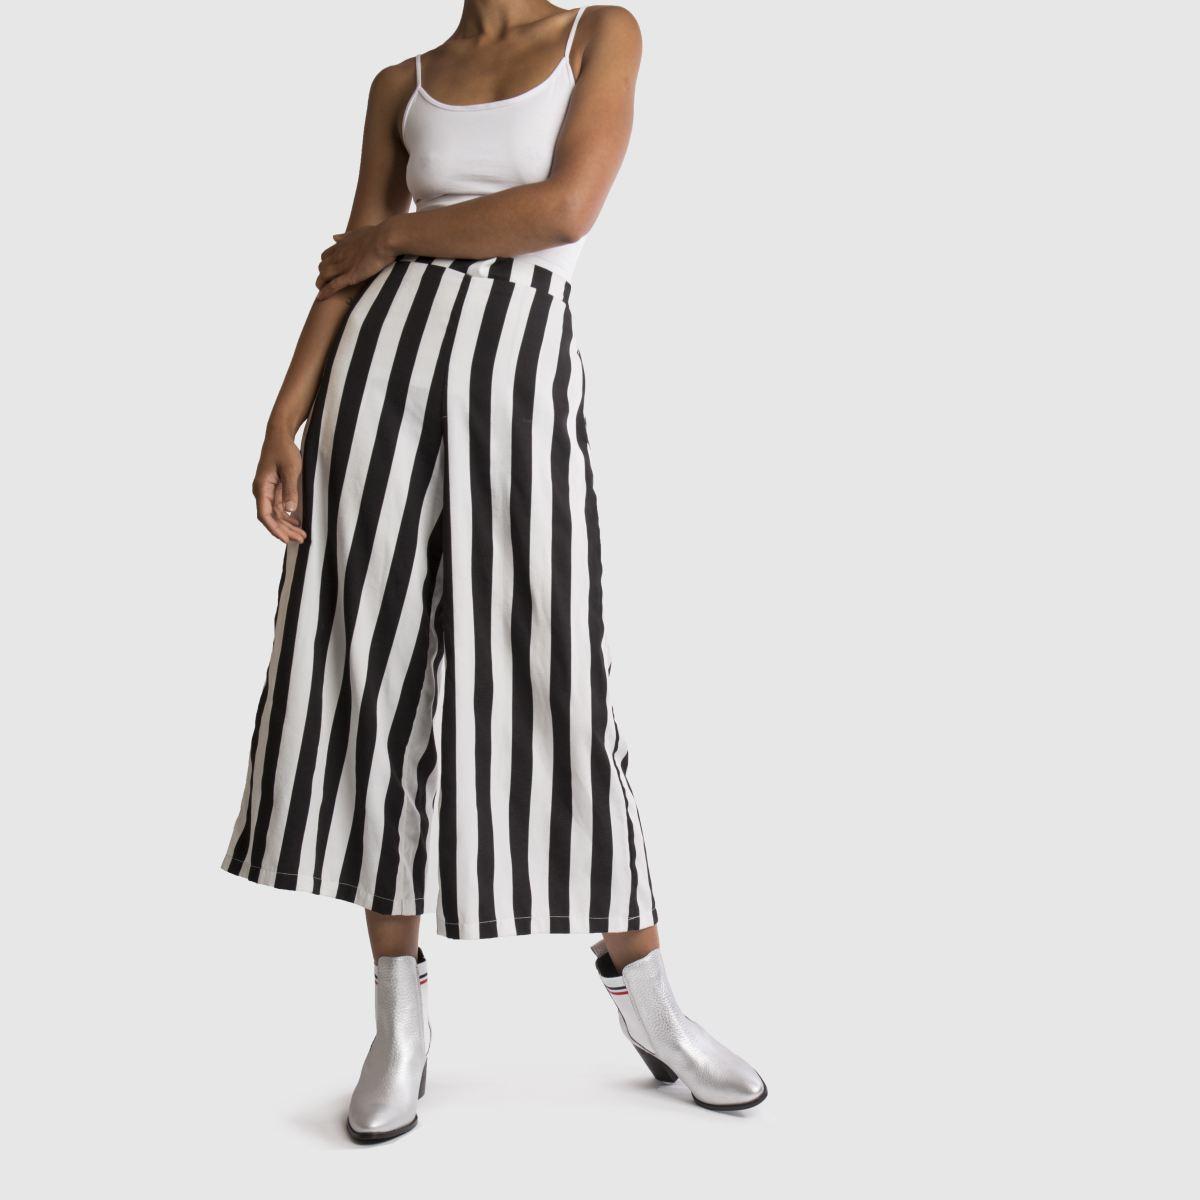 Damen Silber tommy hilfiger Tj Sock Shiny Mid Heel Chunky Boots | schuh Gute Qualität beliebte Schuhe